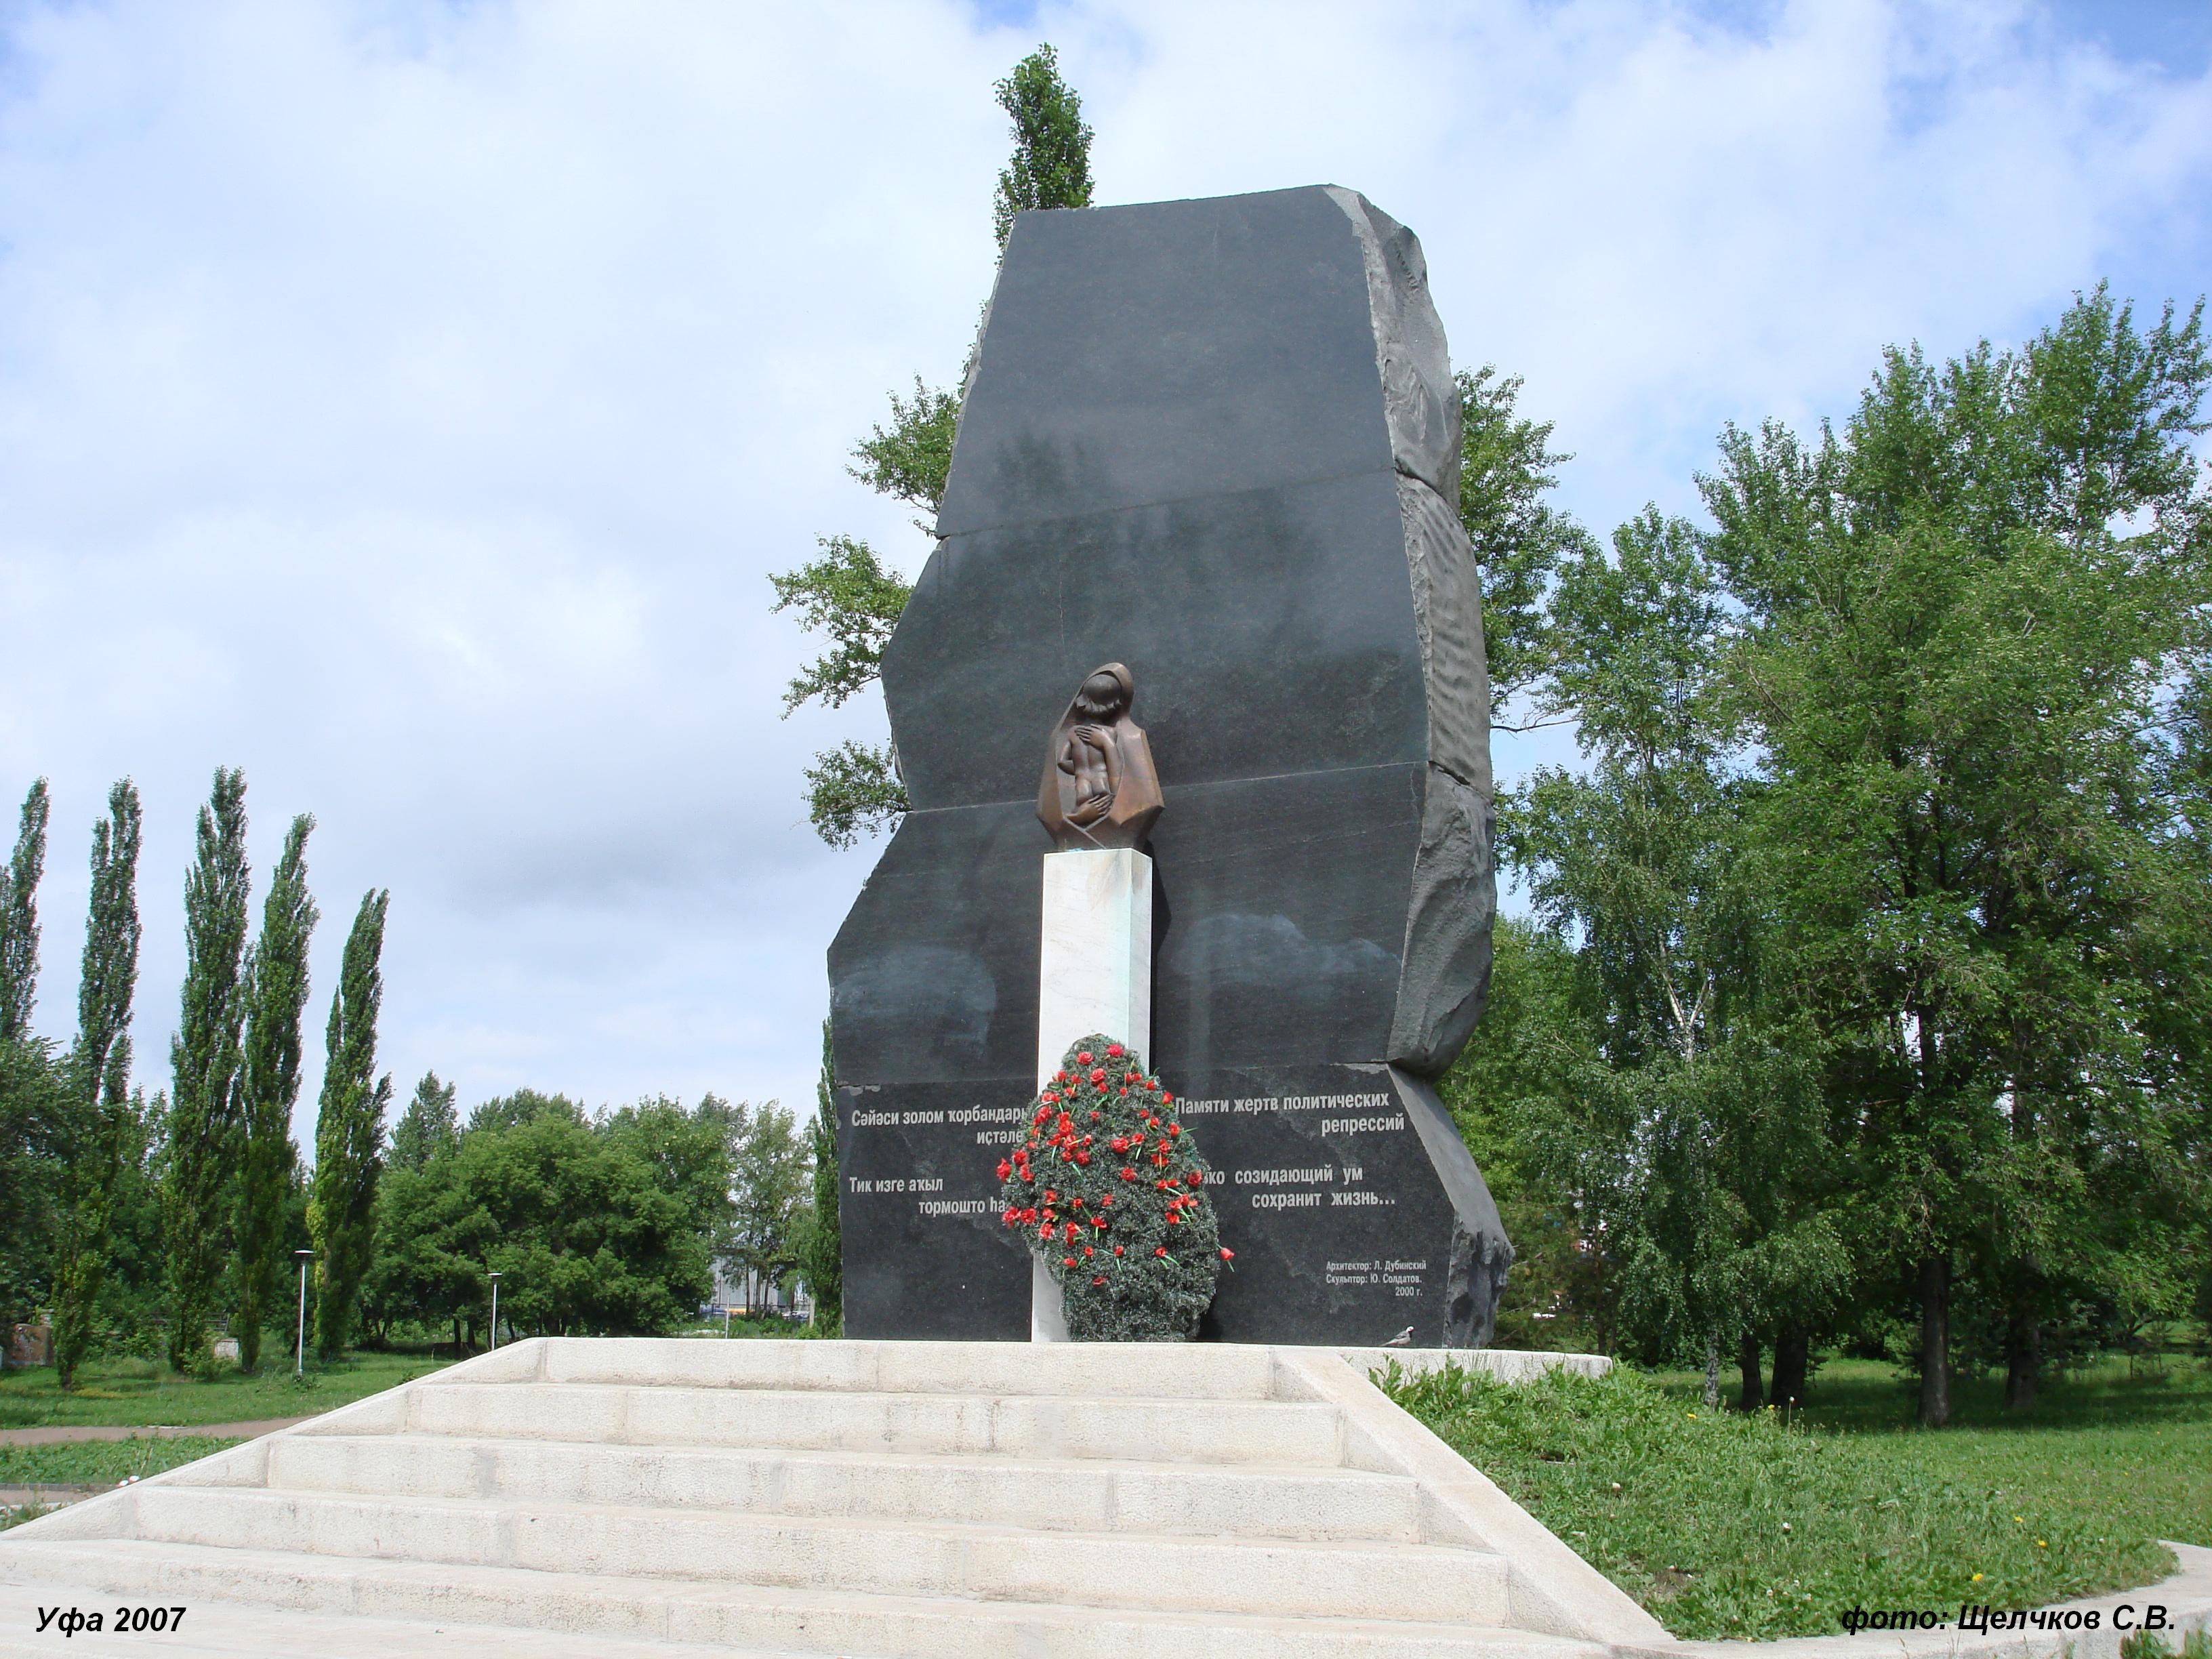 http://cp12.nevsepic.com.ua/92/1348493417-1060336-pomyatnik-zhertvam-repressij.jpg